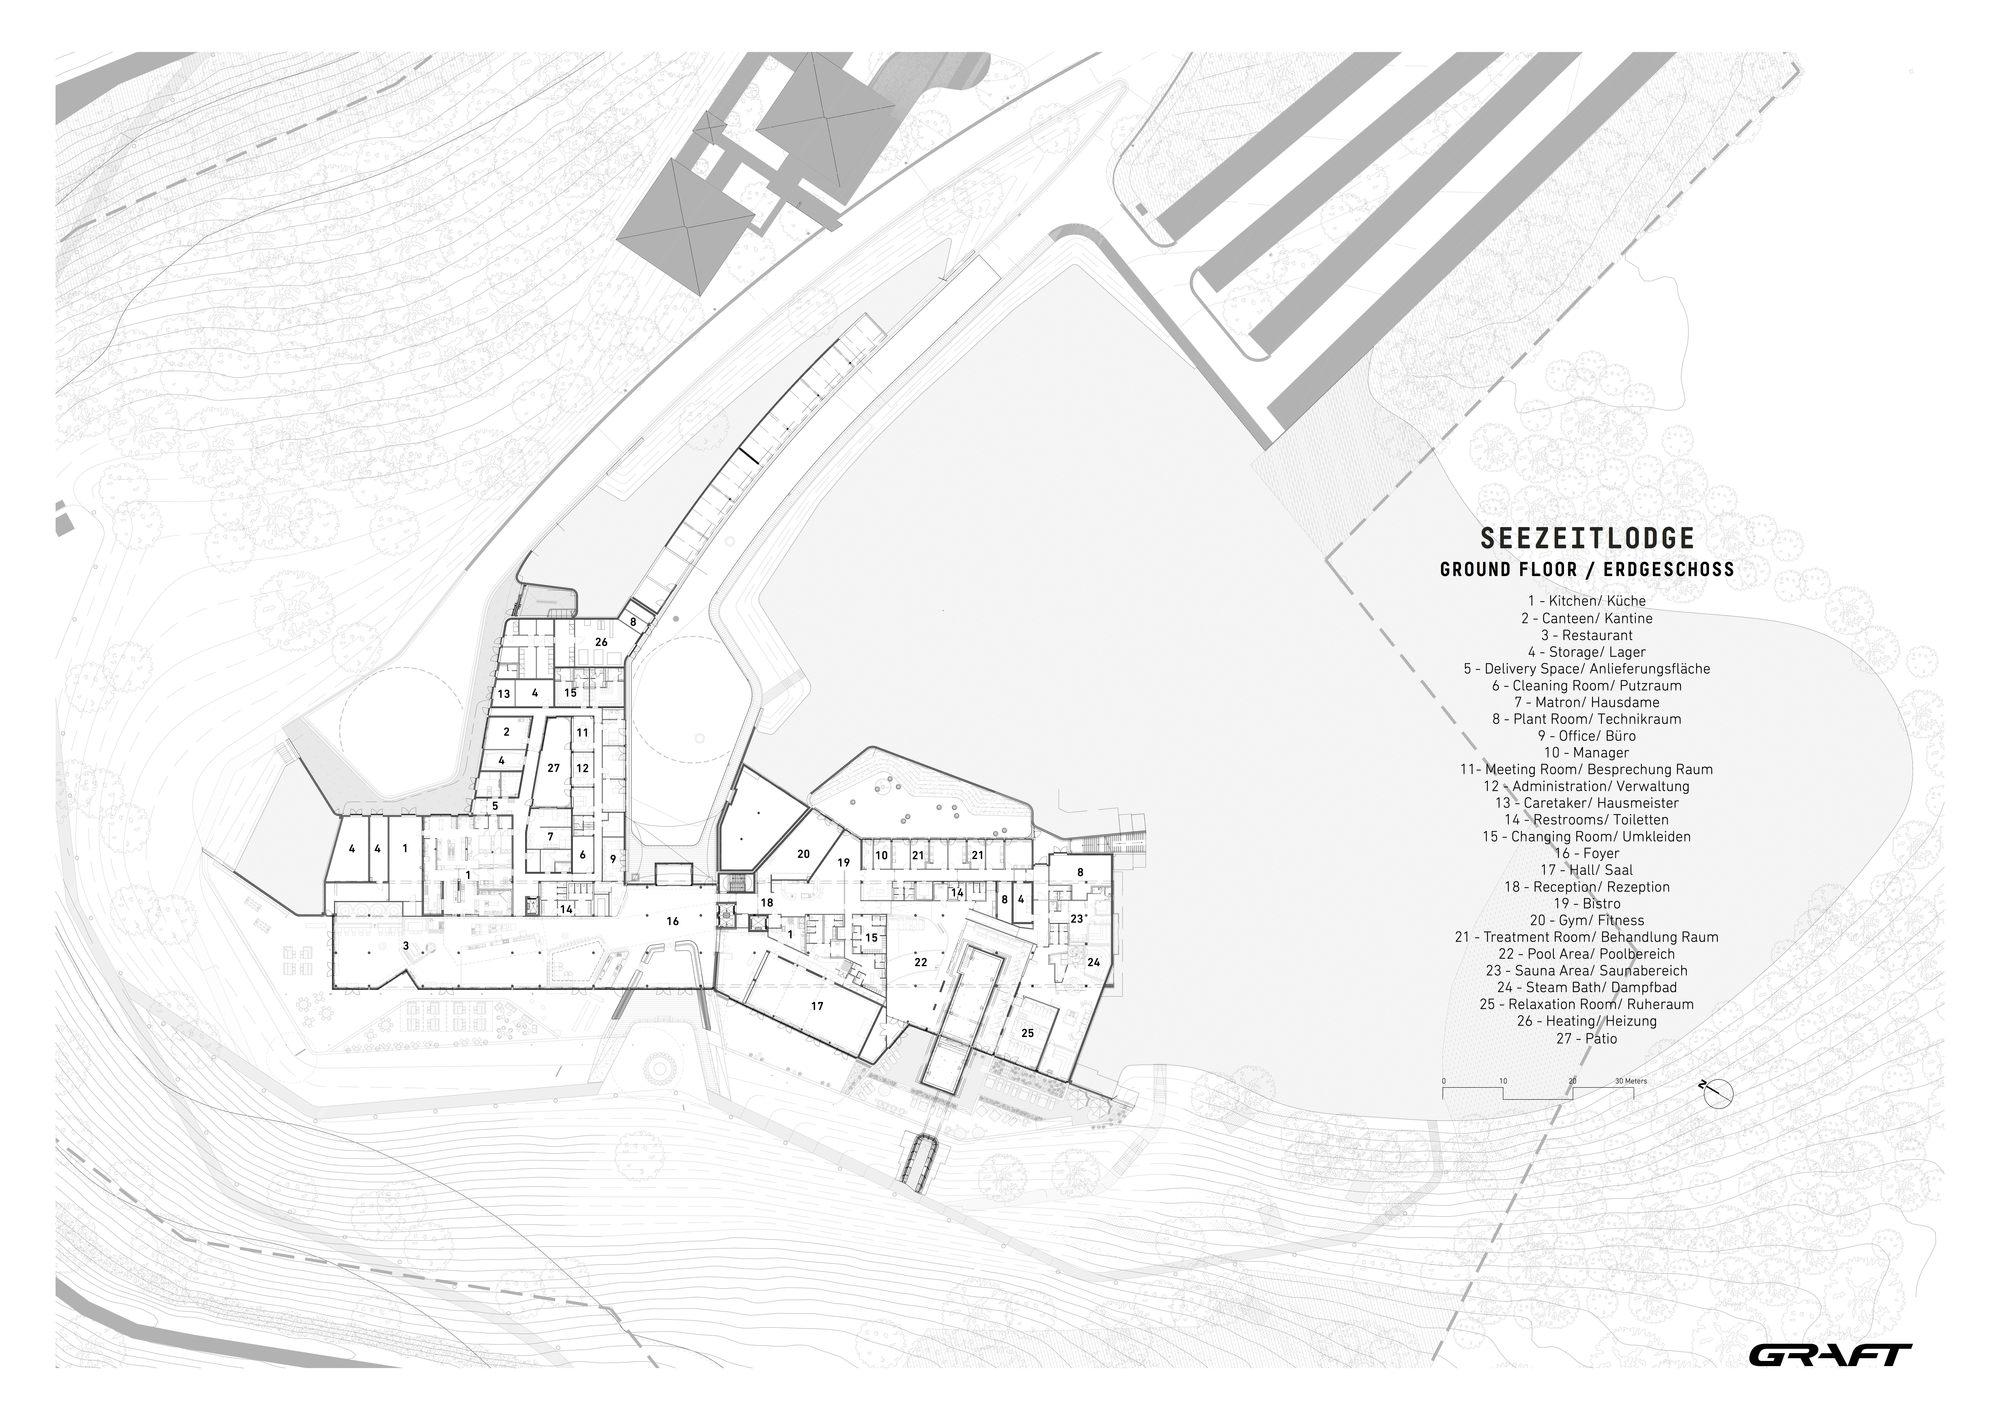 Gallery Of Hotel Spa Seezeitlodge Graft Architects 23